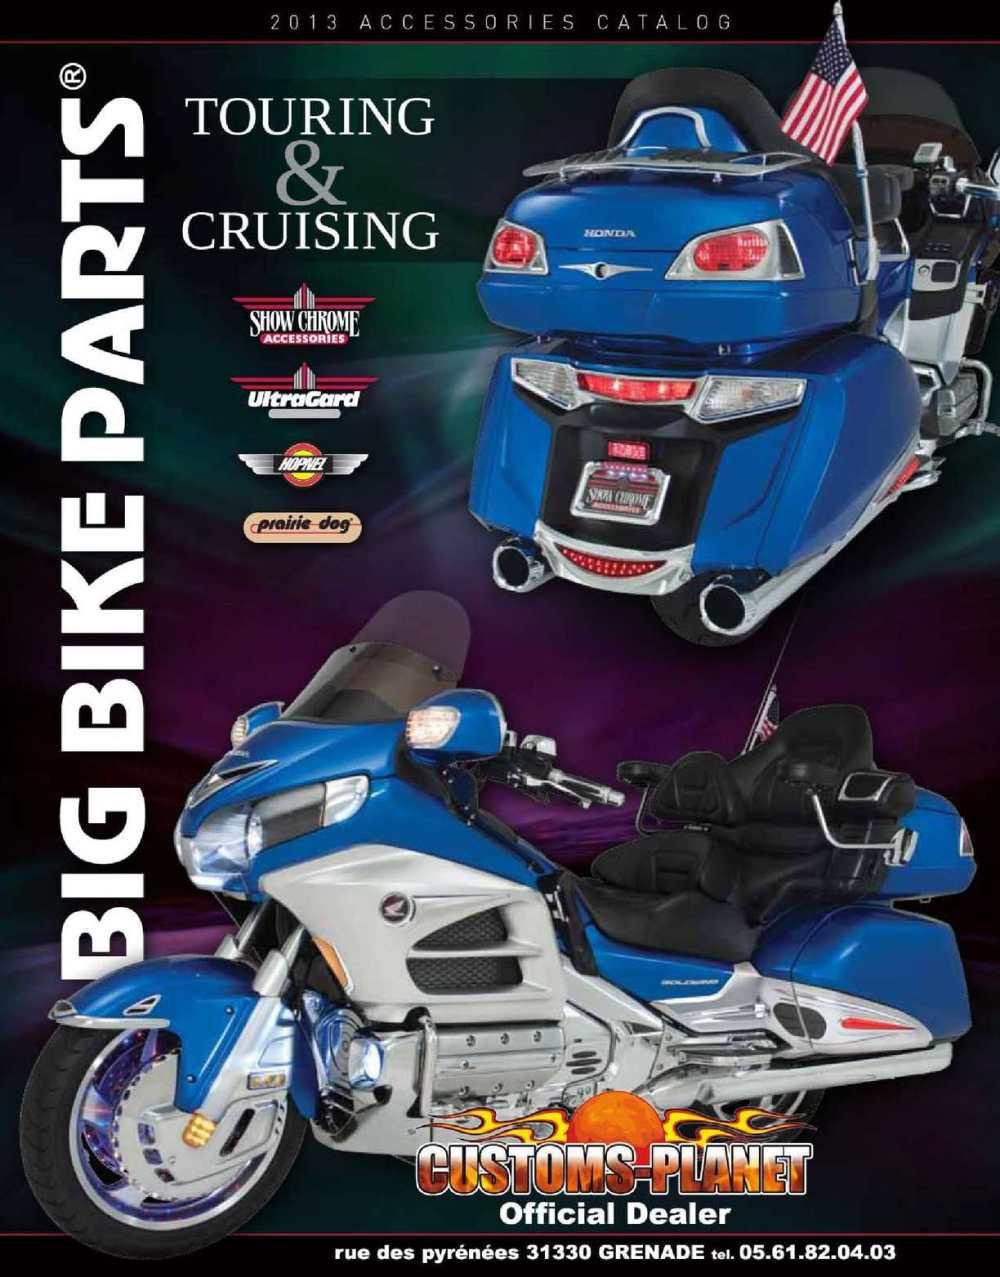 medium resolution of catalogue big bike parts par customs planet